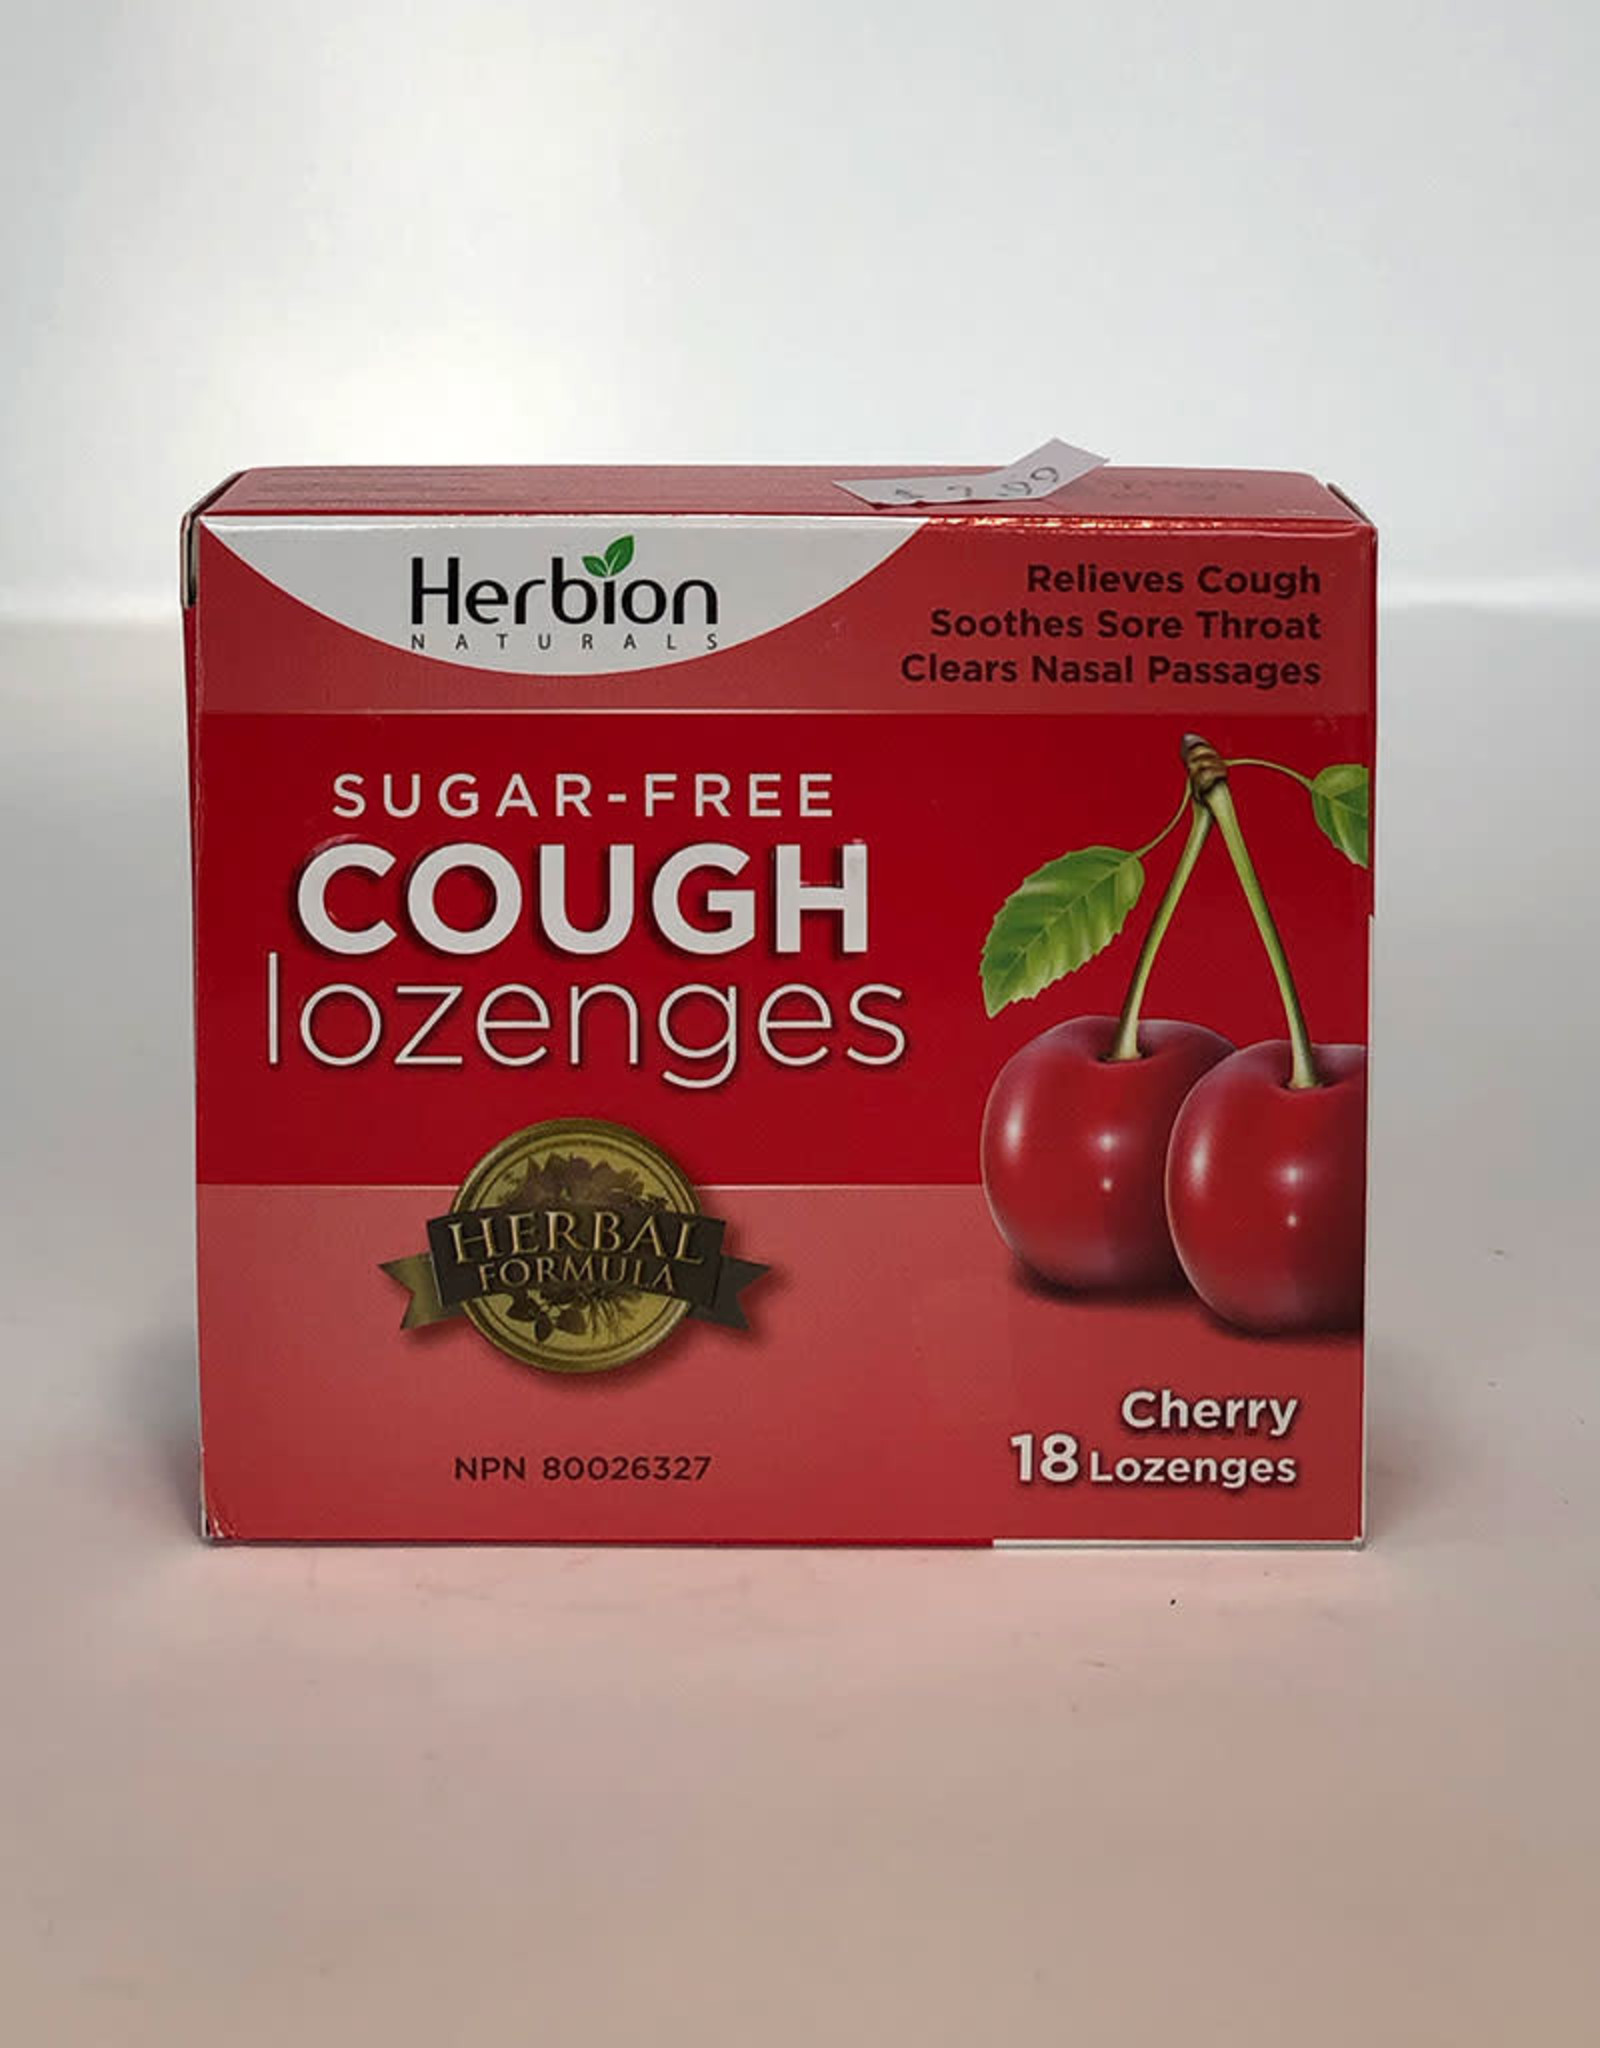 Herbion Herbion - Sugar Free Cough Lozenges, Cherry